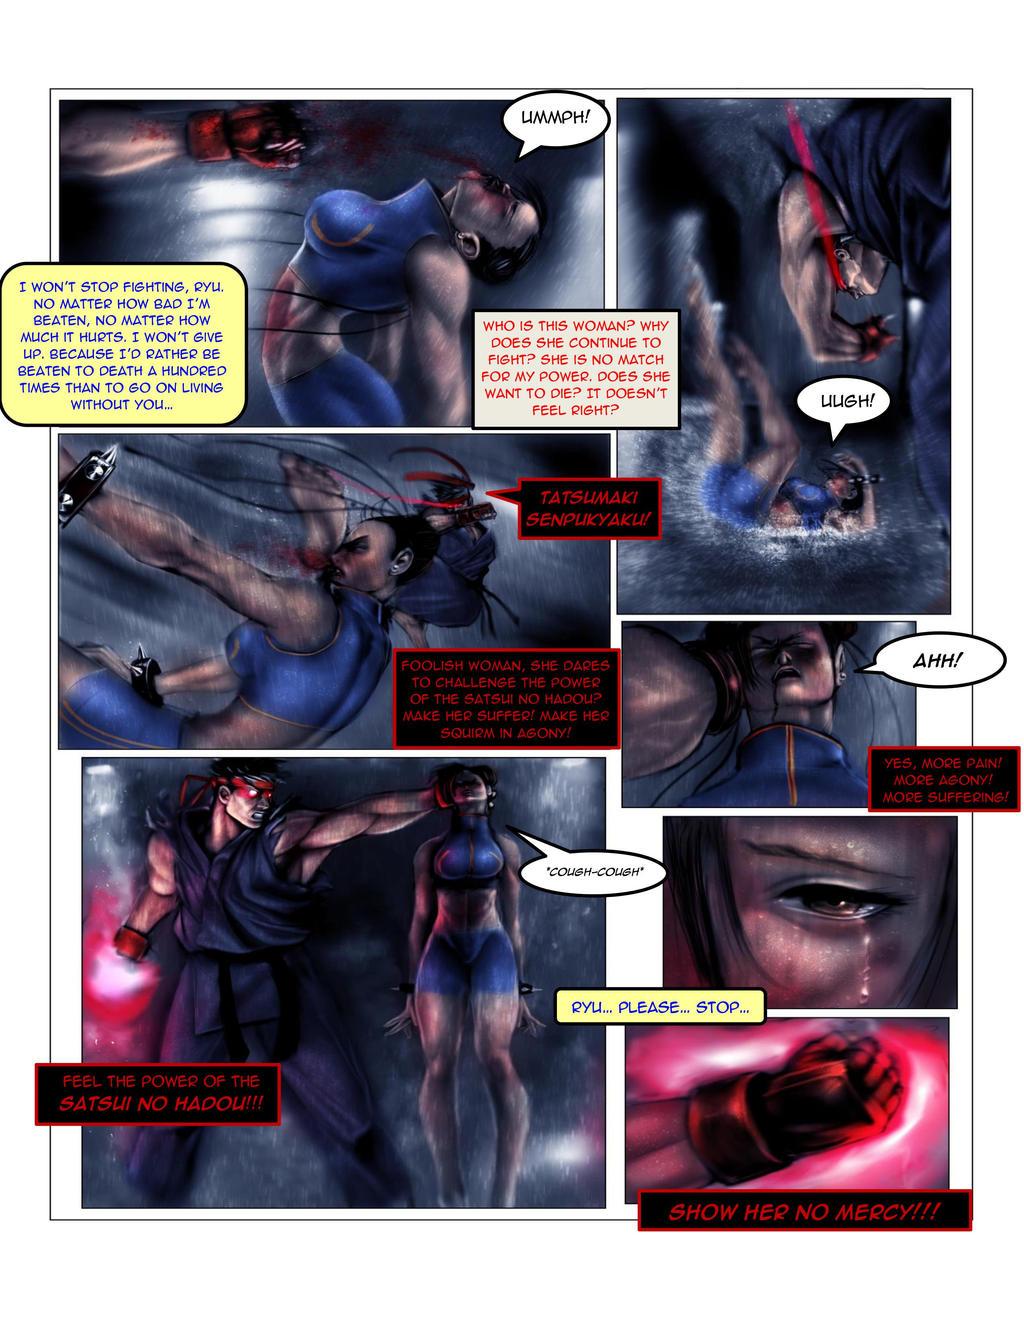 evil_ryu_vs_chun_li_pg_4_by_tree_ink-d9uth4l.jpg